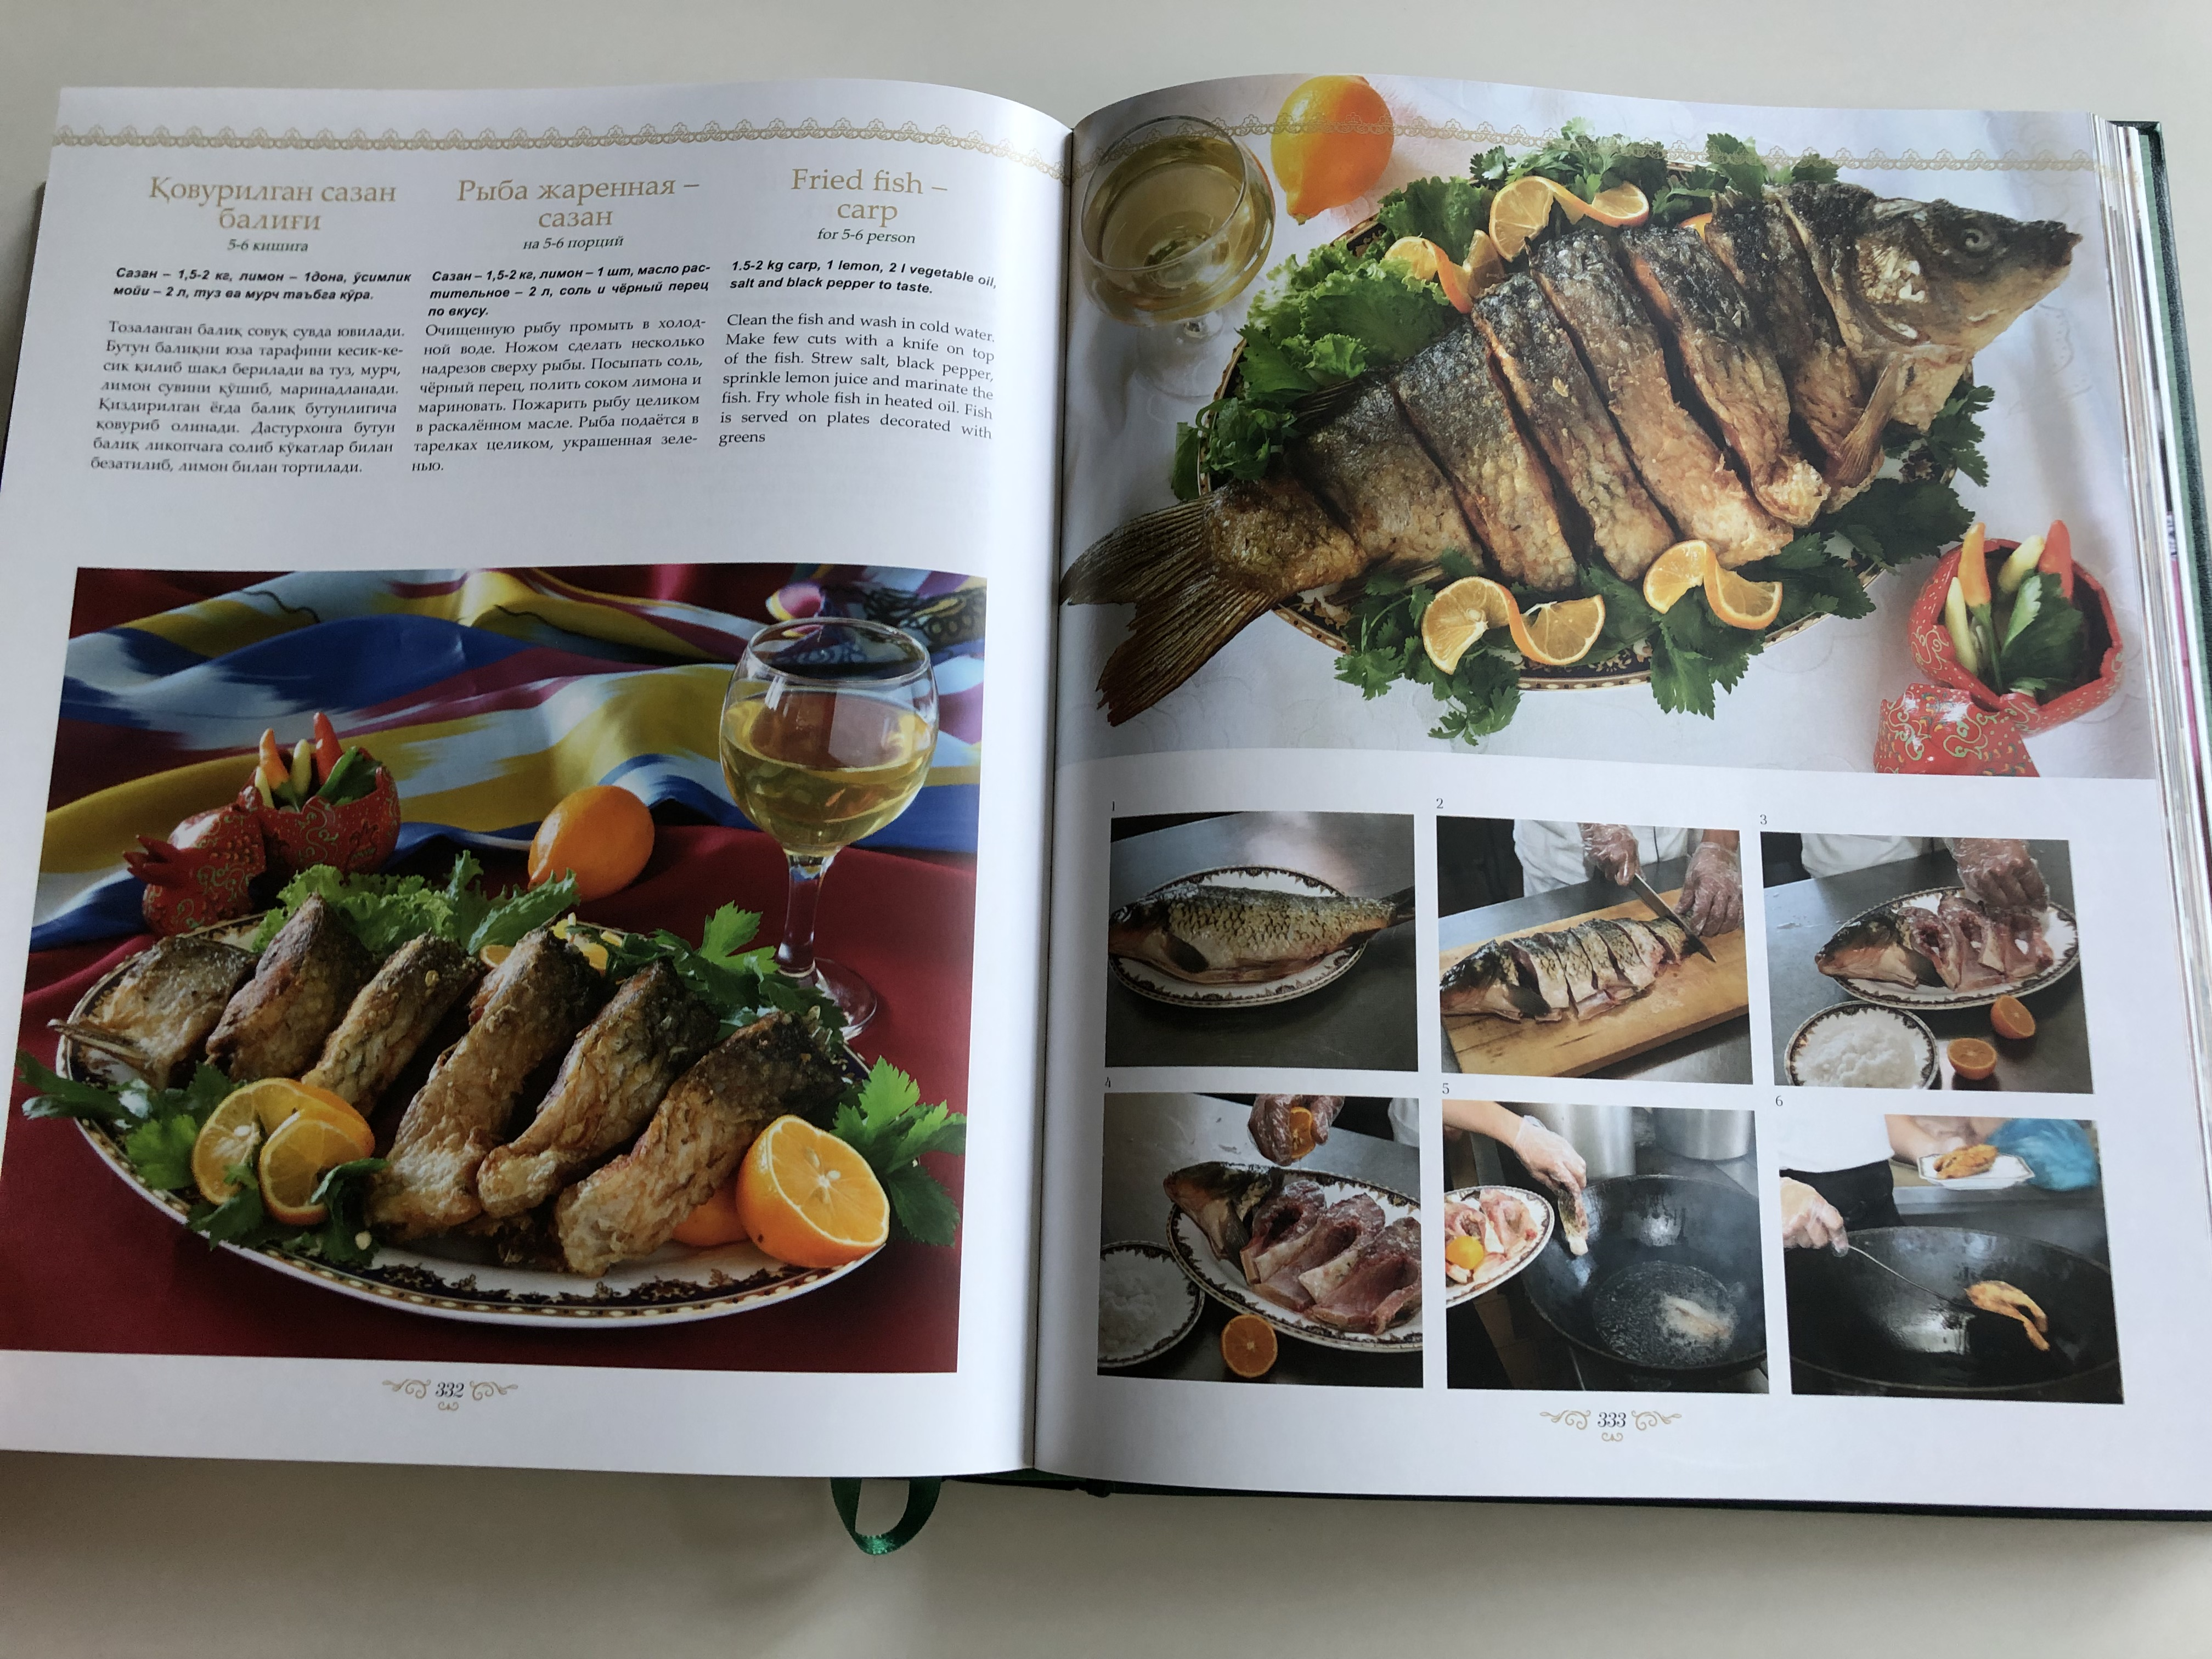 the-art-of-uzbek-cuisine-uzbek-russian-english-edition-hardcover-baktria-press-toshkent-2016-recipes-culture-cuisine-art-42-.jpg